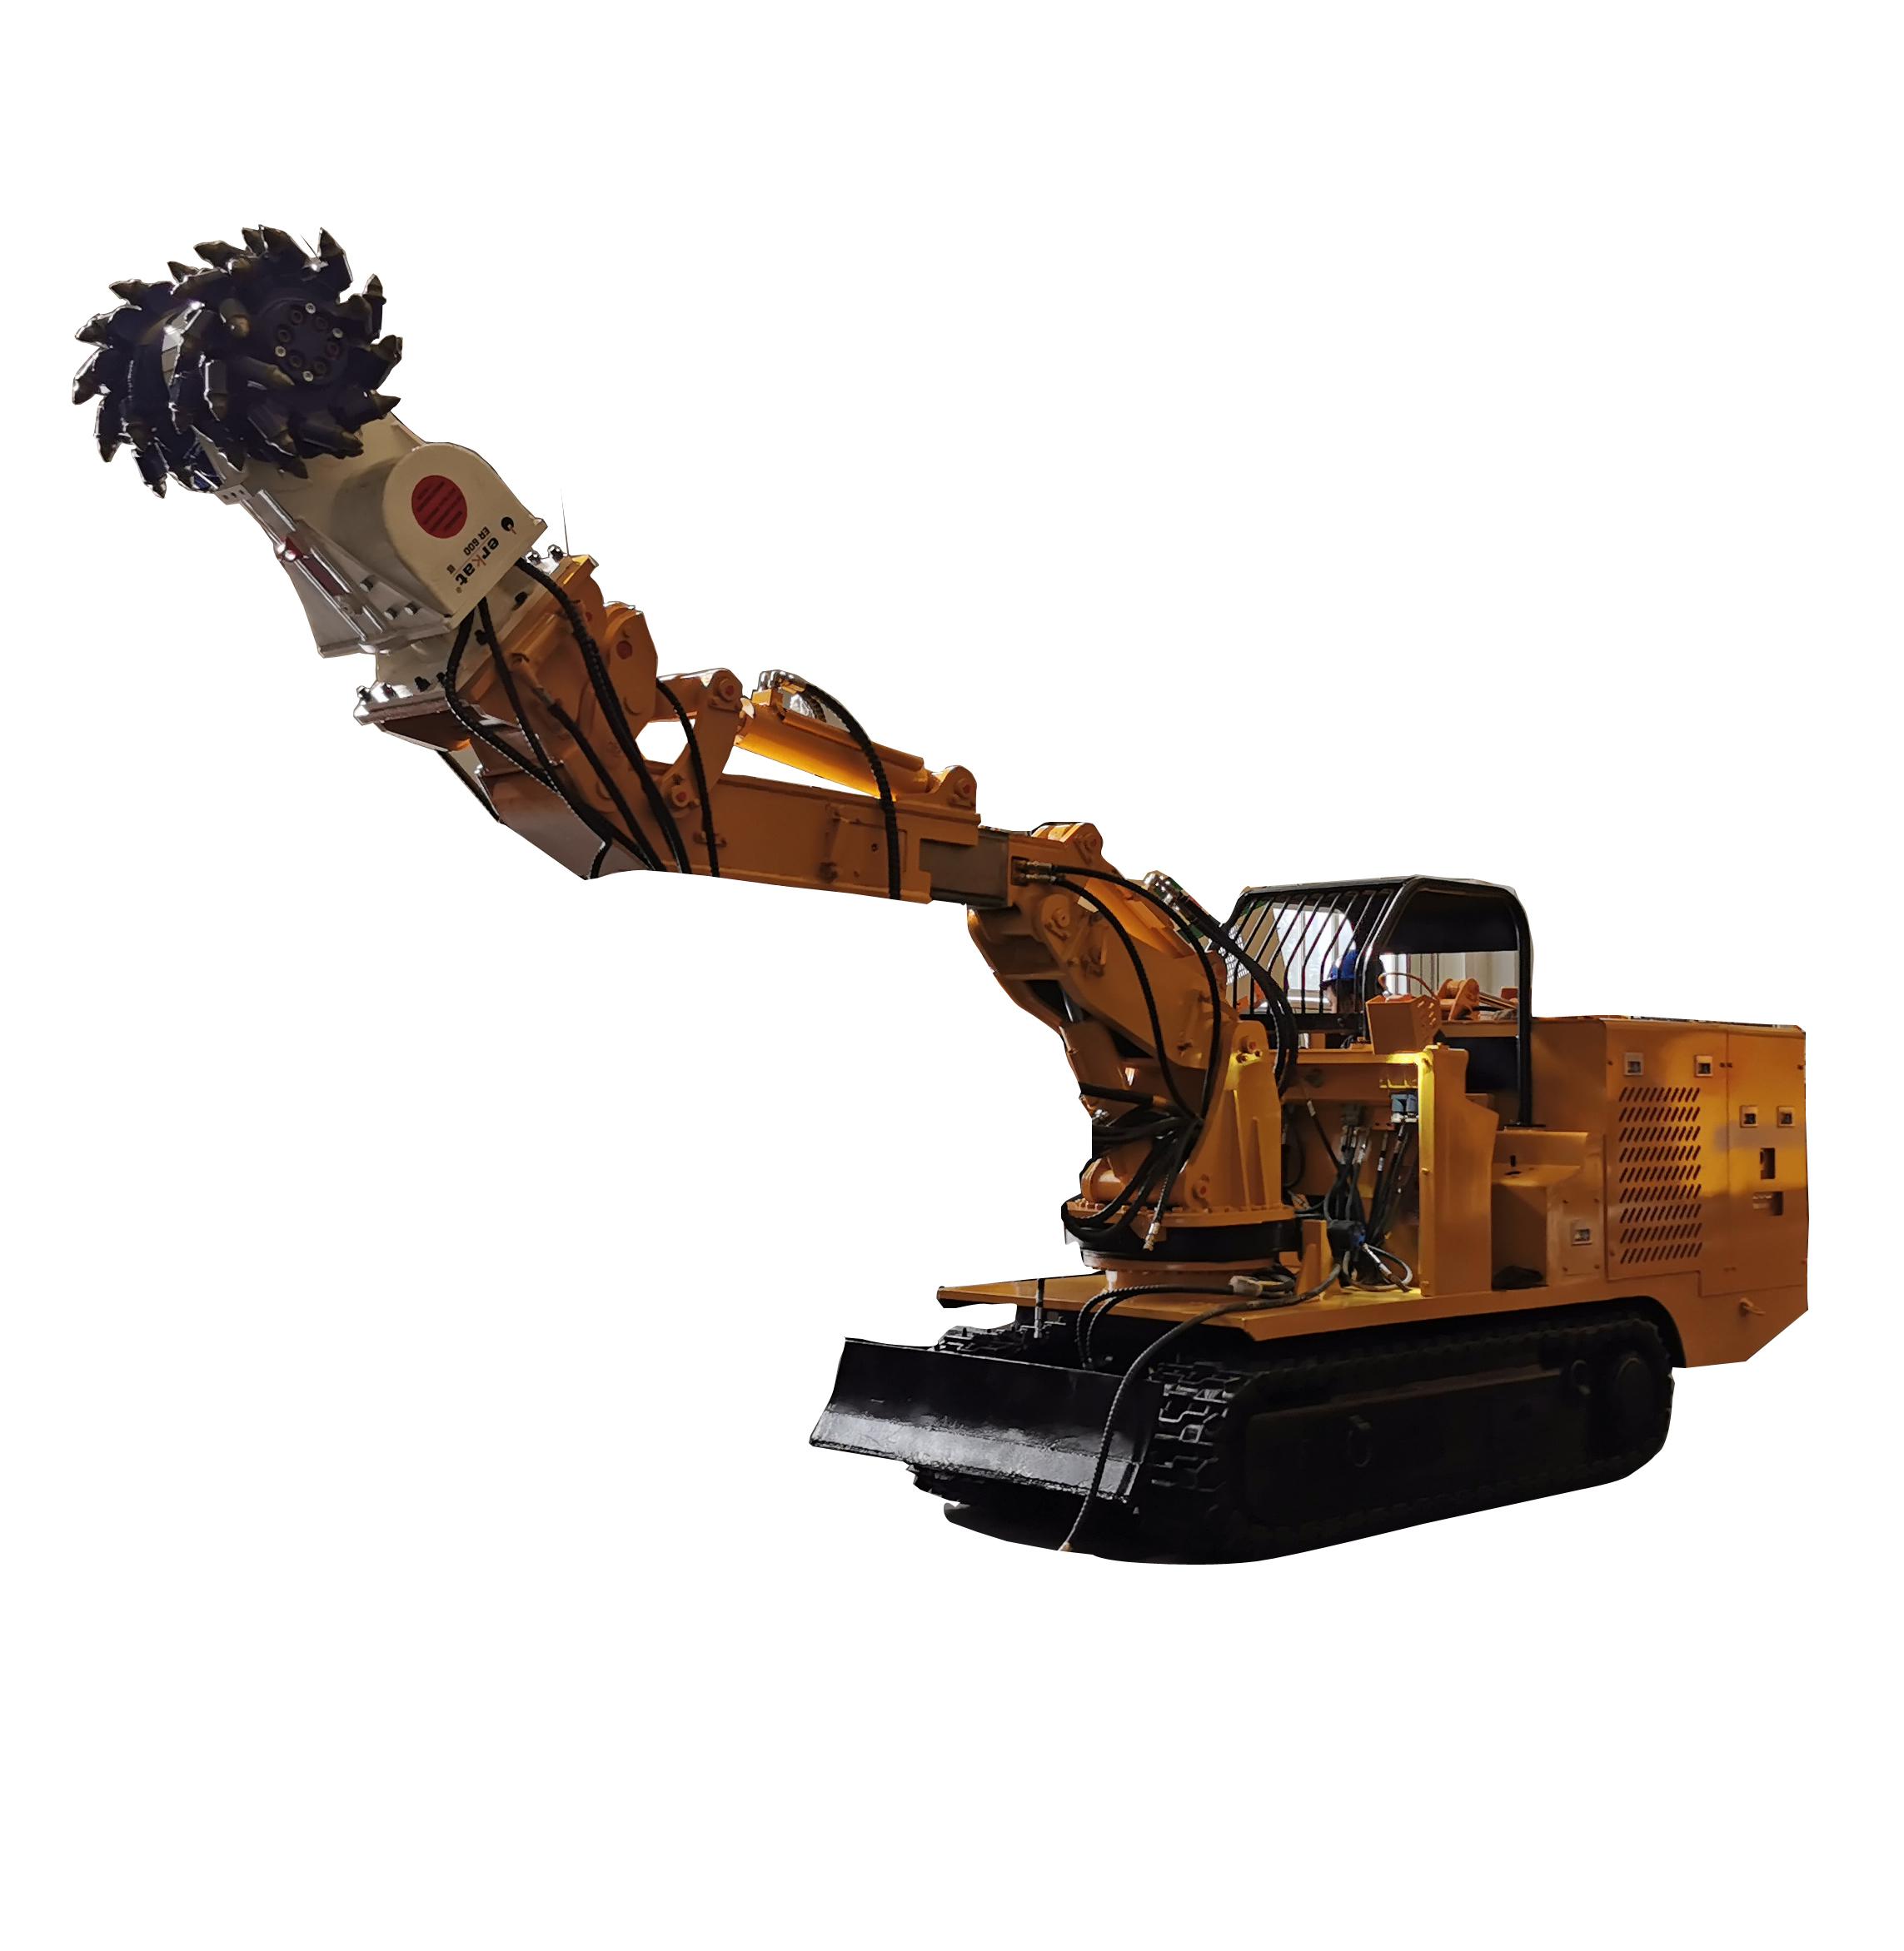 Multi-function Roadway Repairing Machine with Drum Cutter Scissors Breaking Hammer